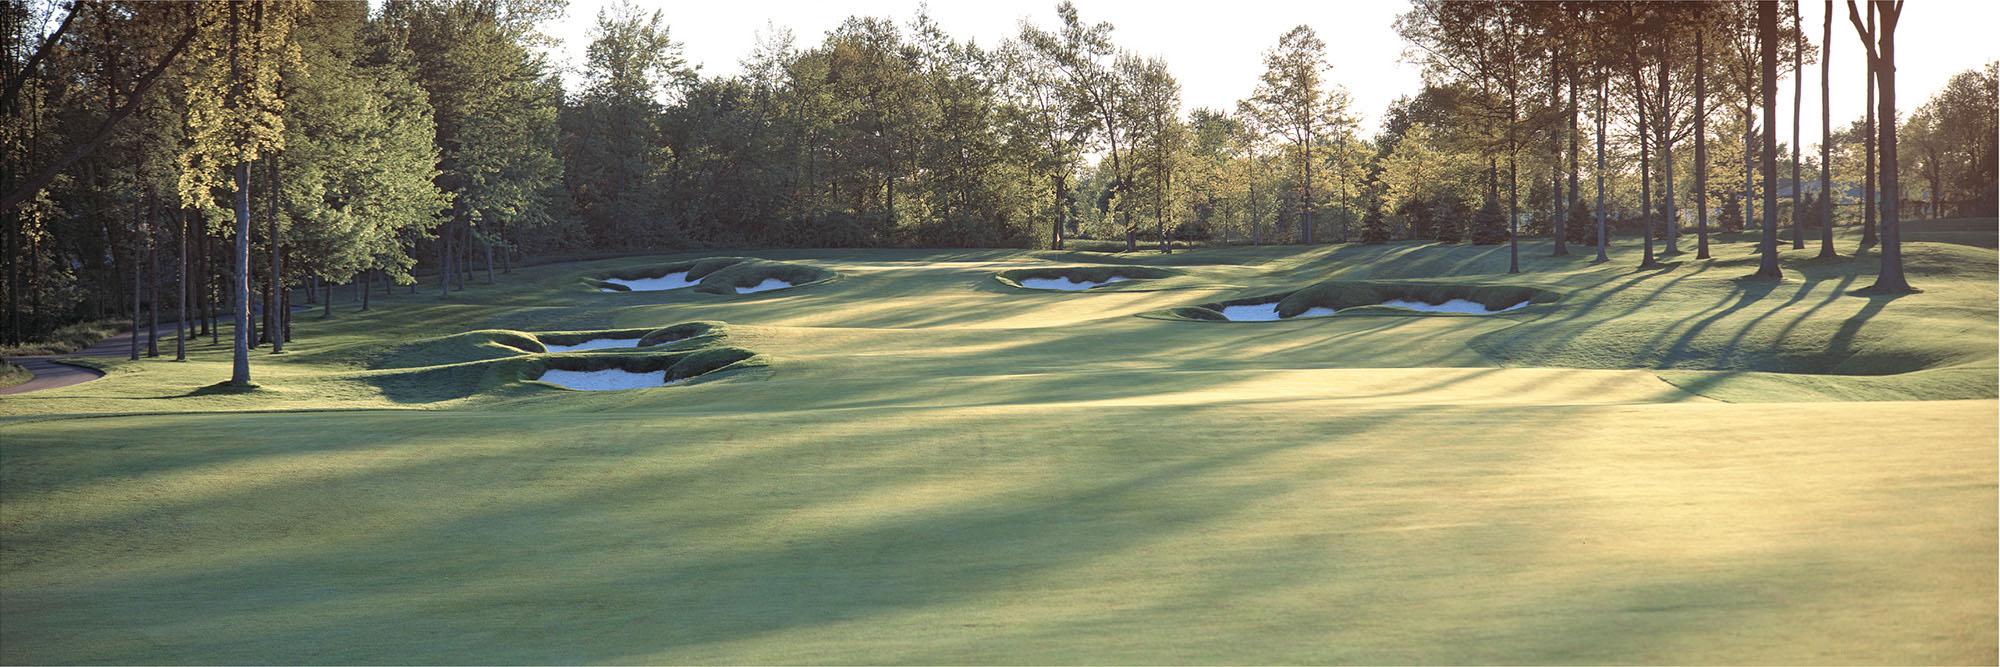 Golf Course Image - Firestone West No. 6